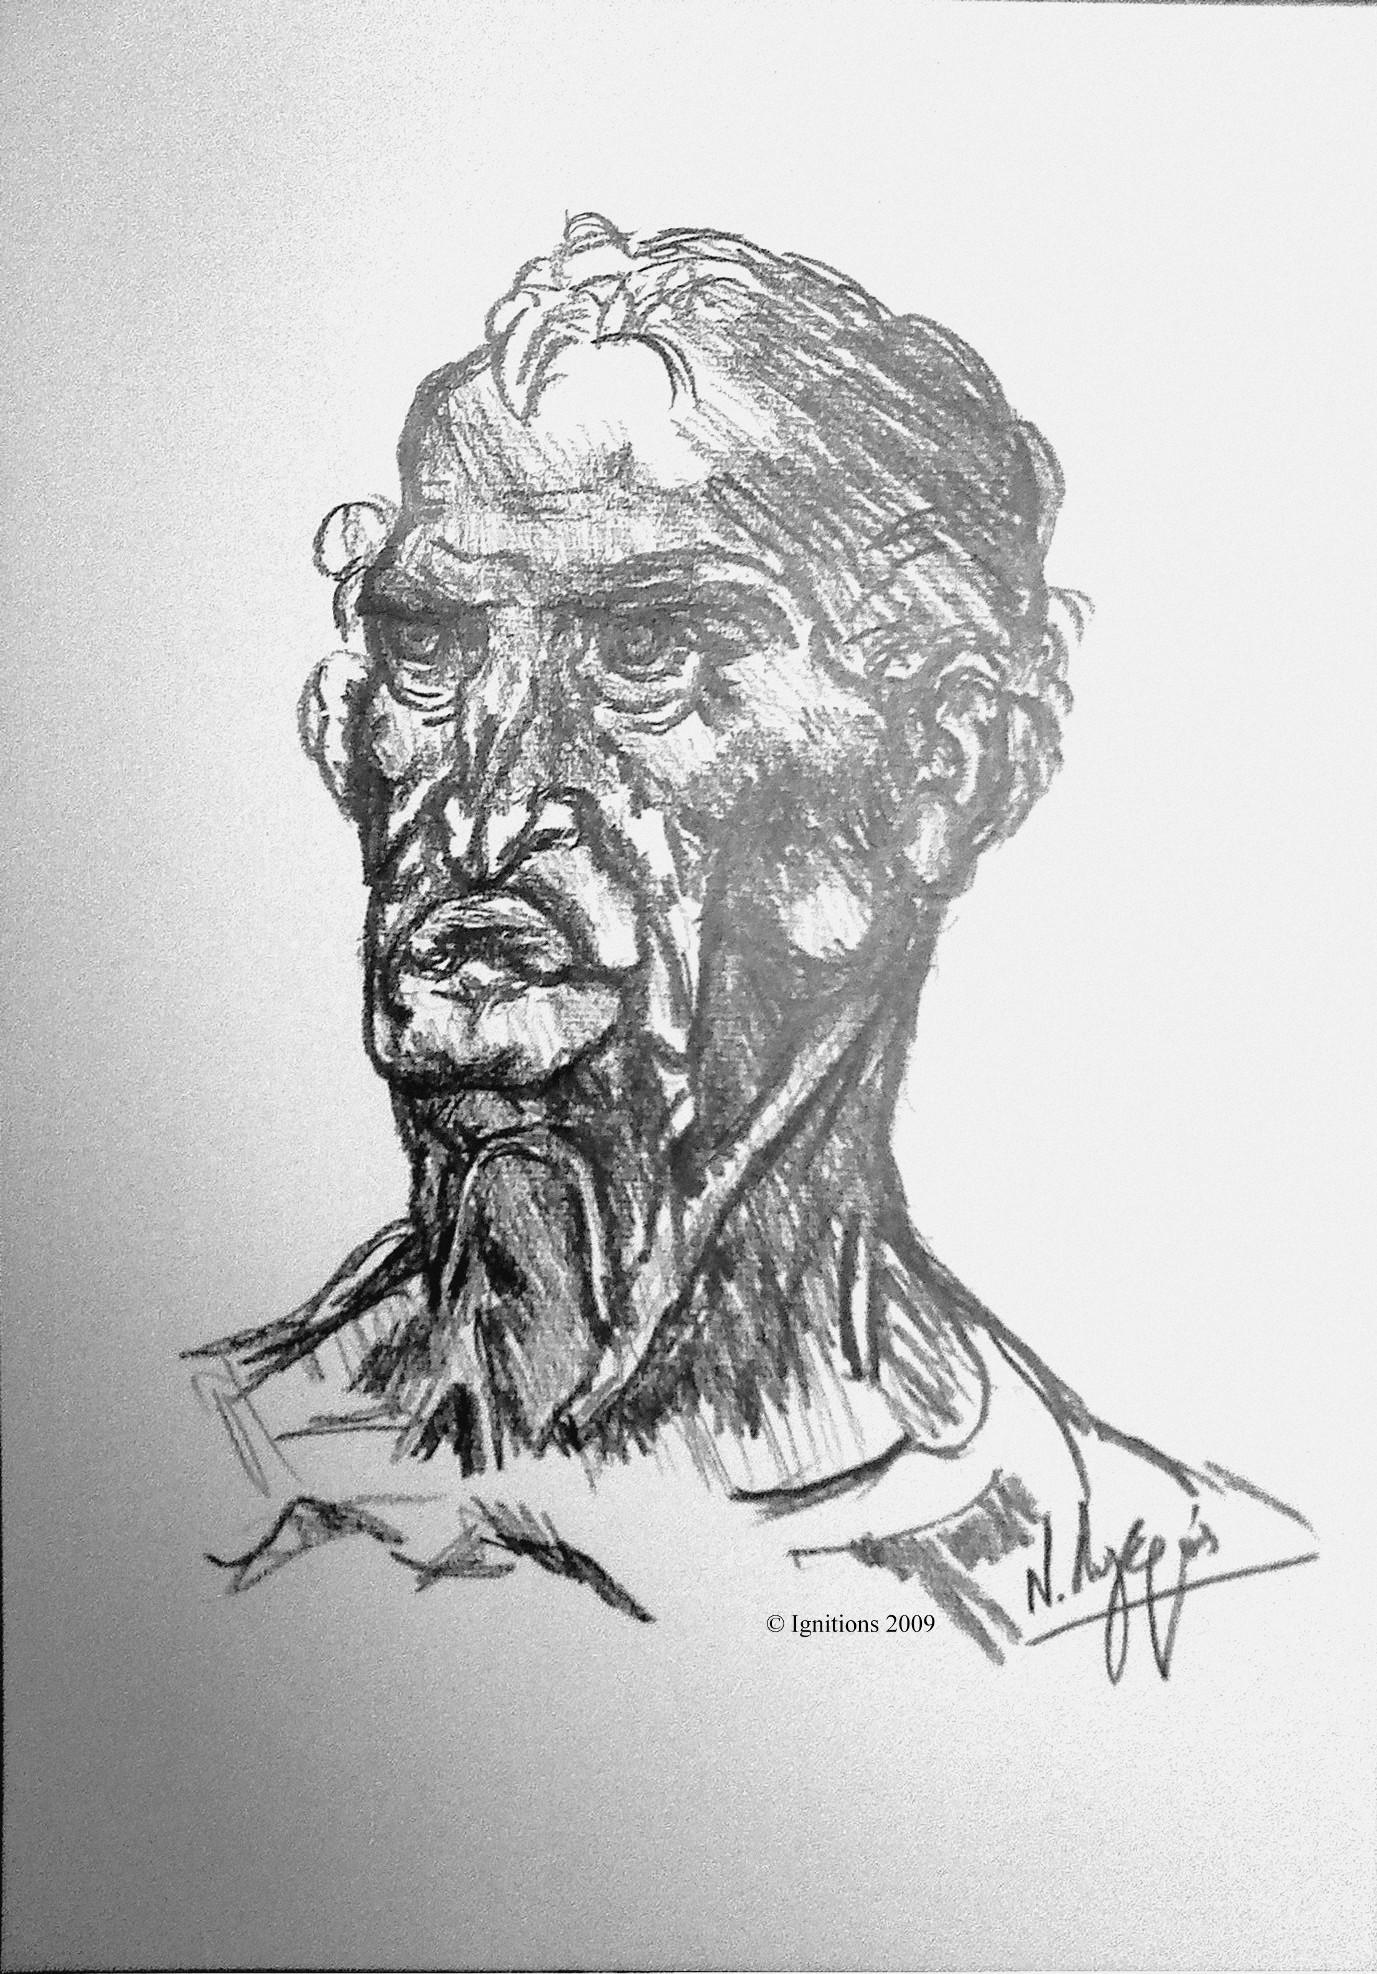 Etude de caractère d'un homme âgé de Leonardo da Vinci.